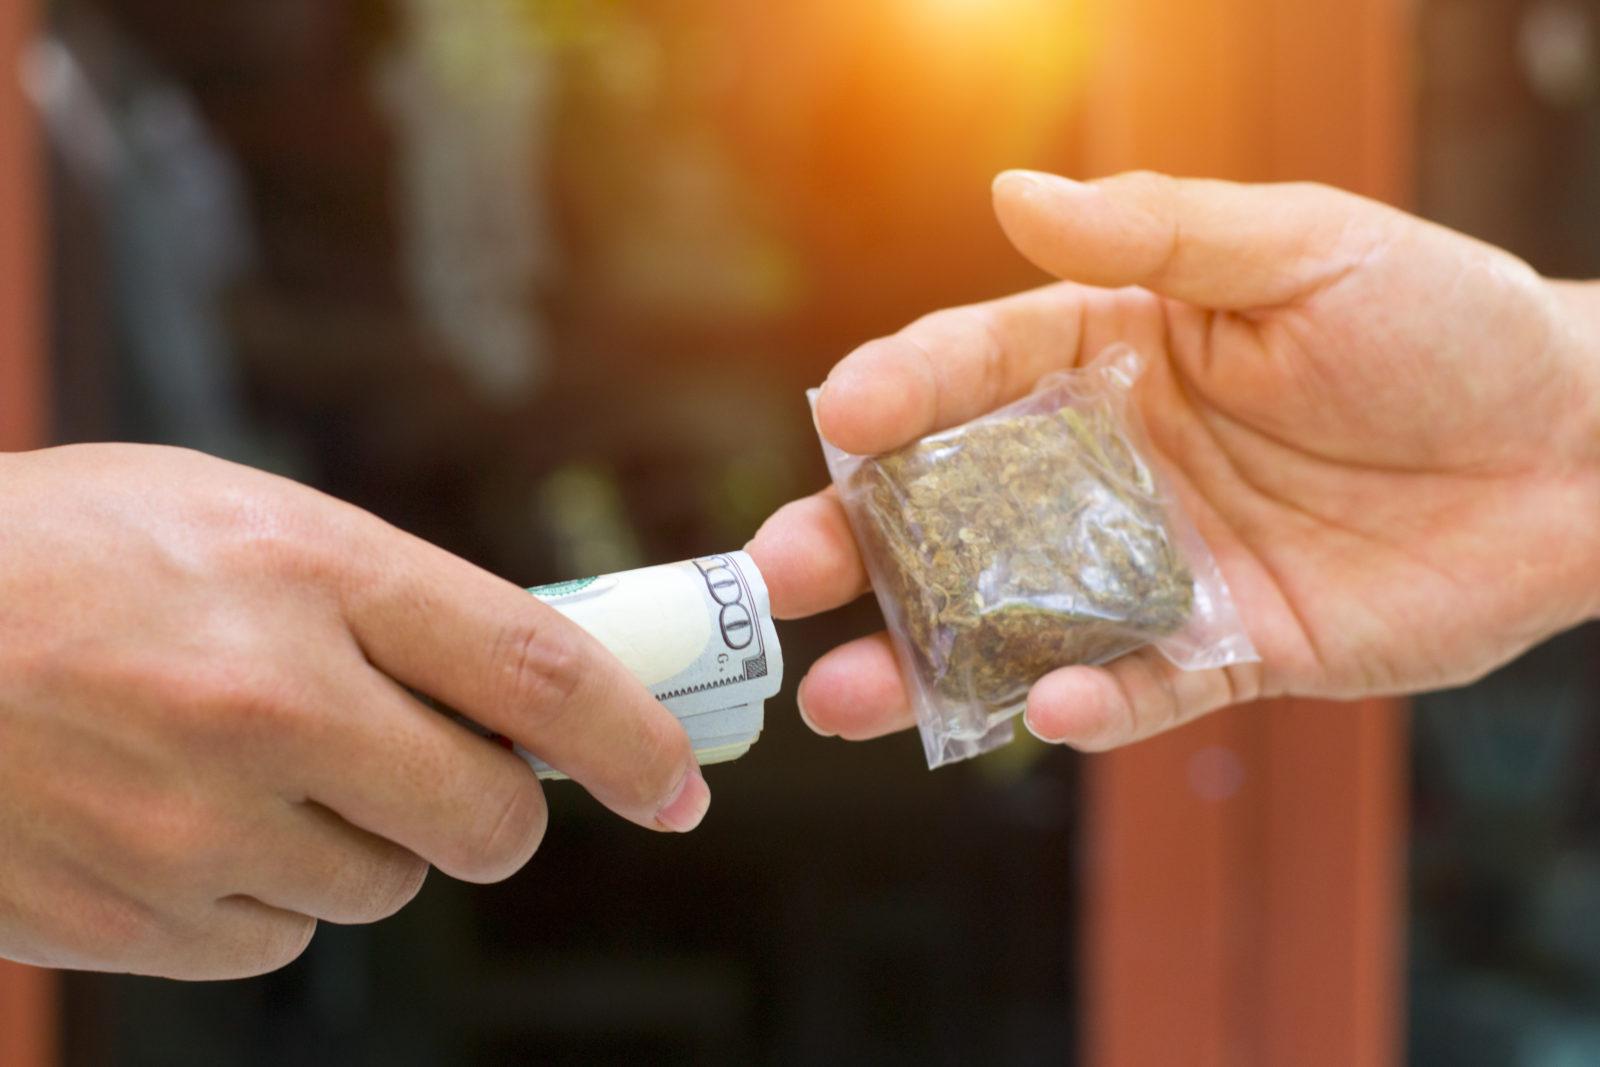 Defensa Penal - Drugs